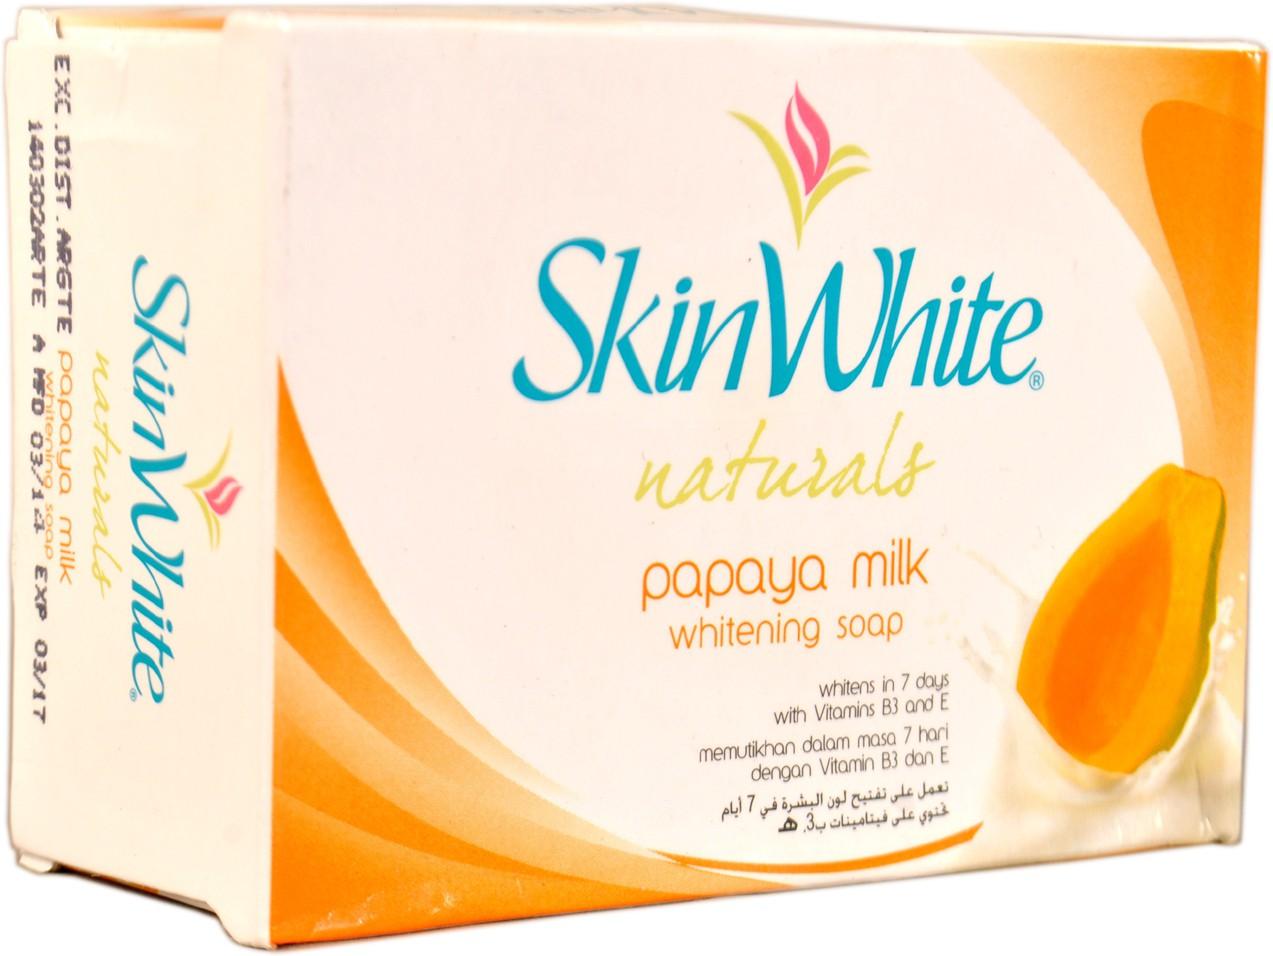 Skin White Naturals Papaya Milk Whitening Soap /Skin ...